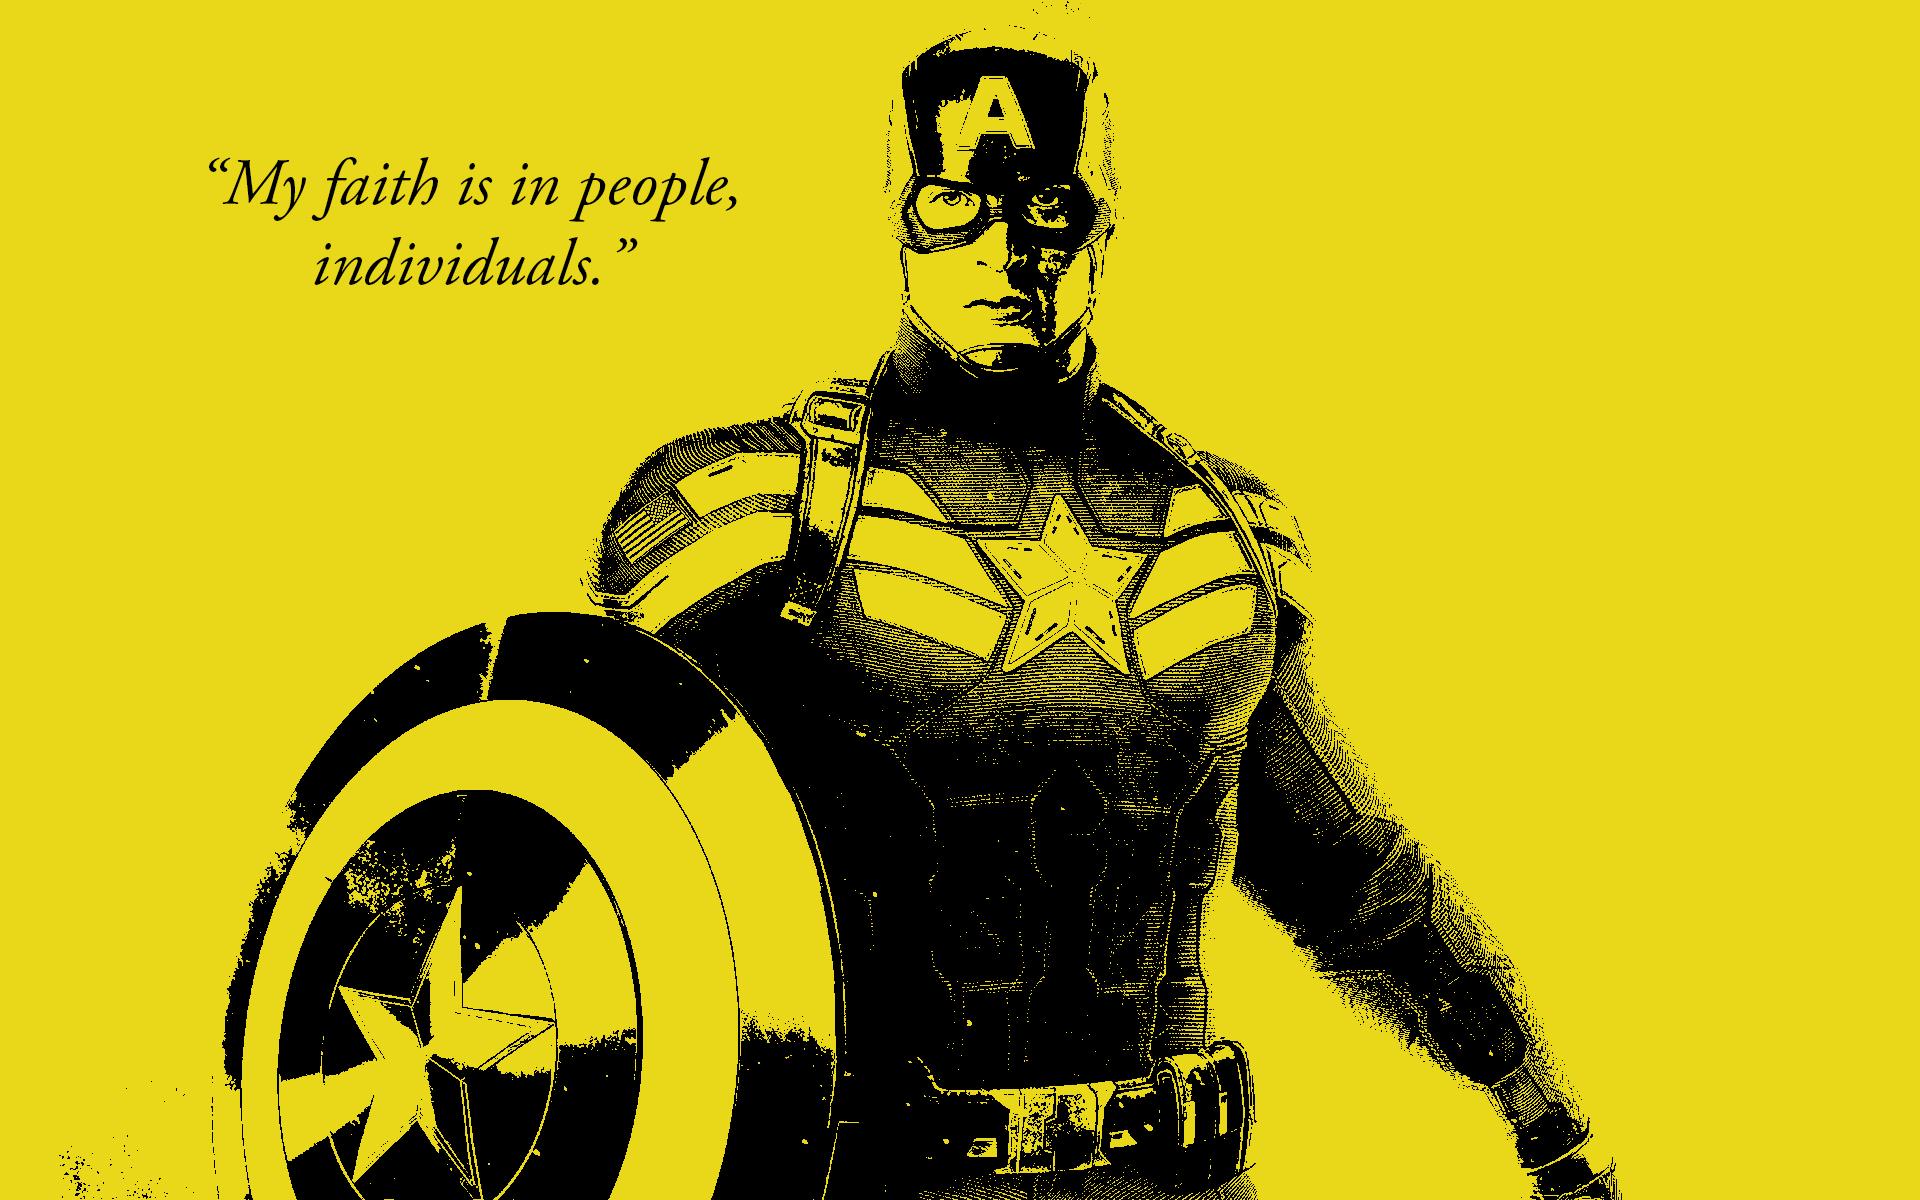 libertarian wallpaper - photo #1